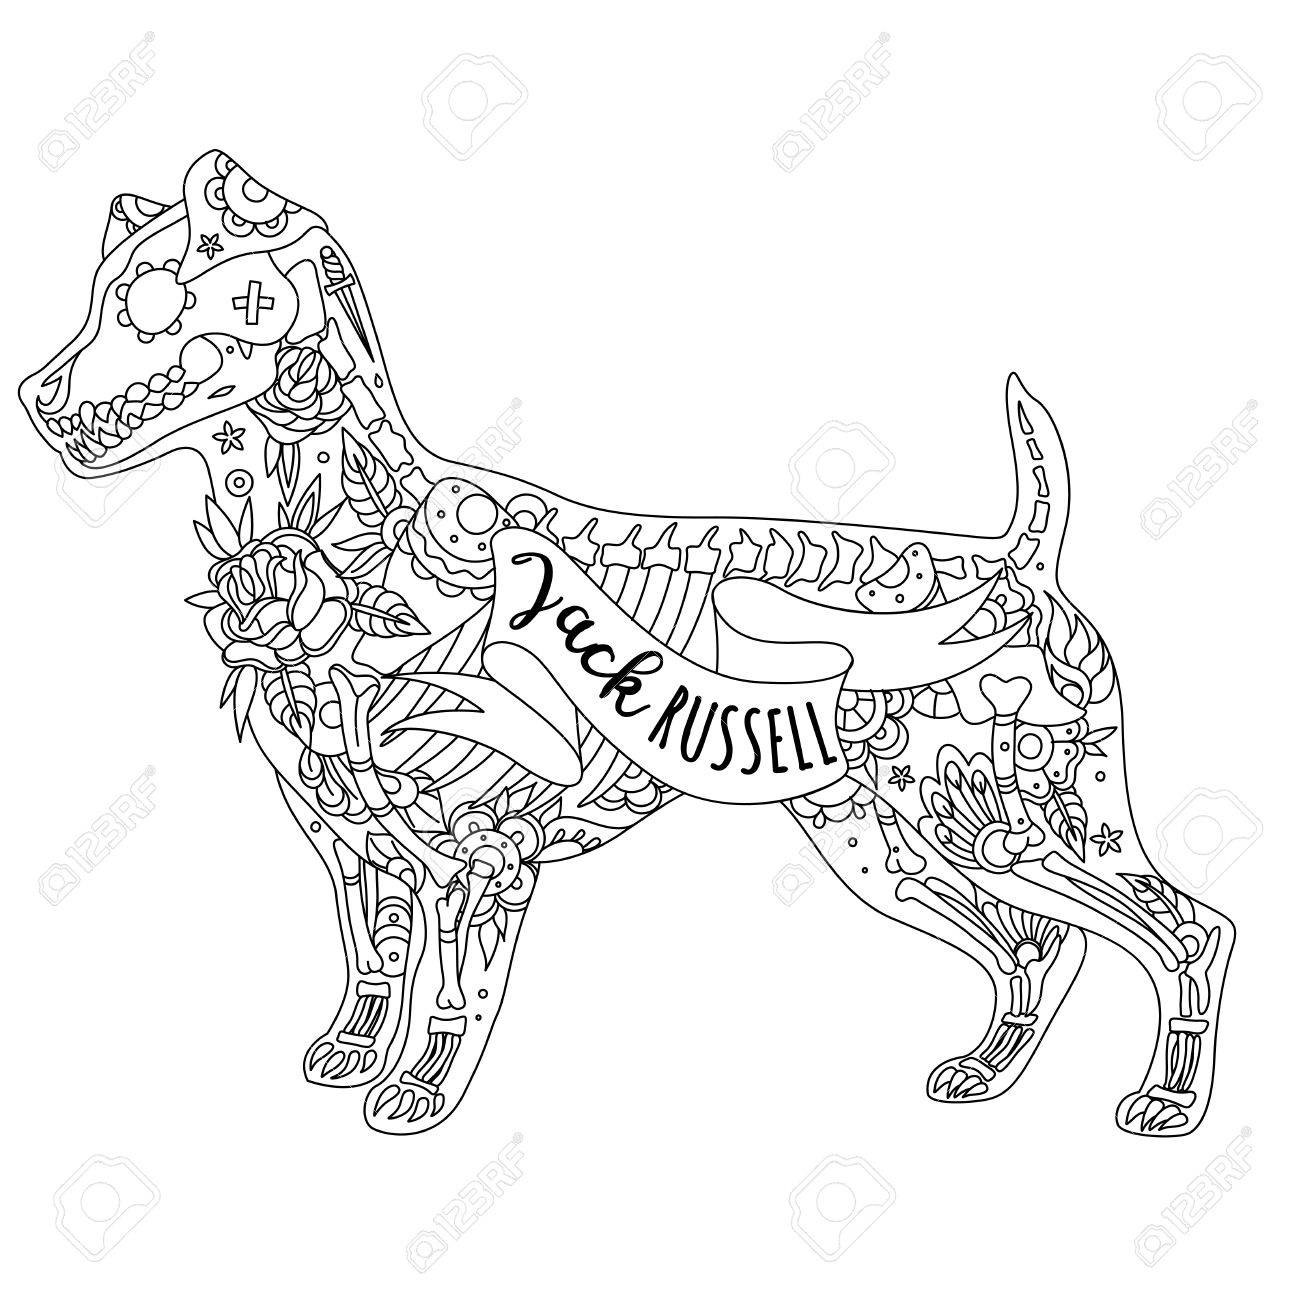 Dog Skeleton Drawing At Getdrawings